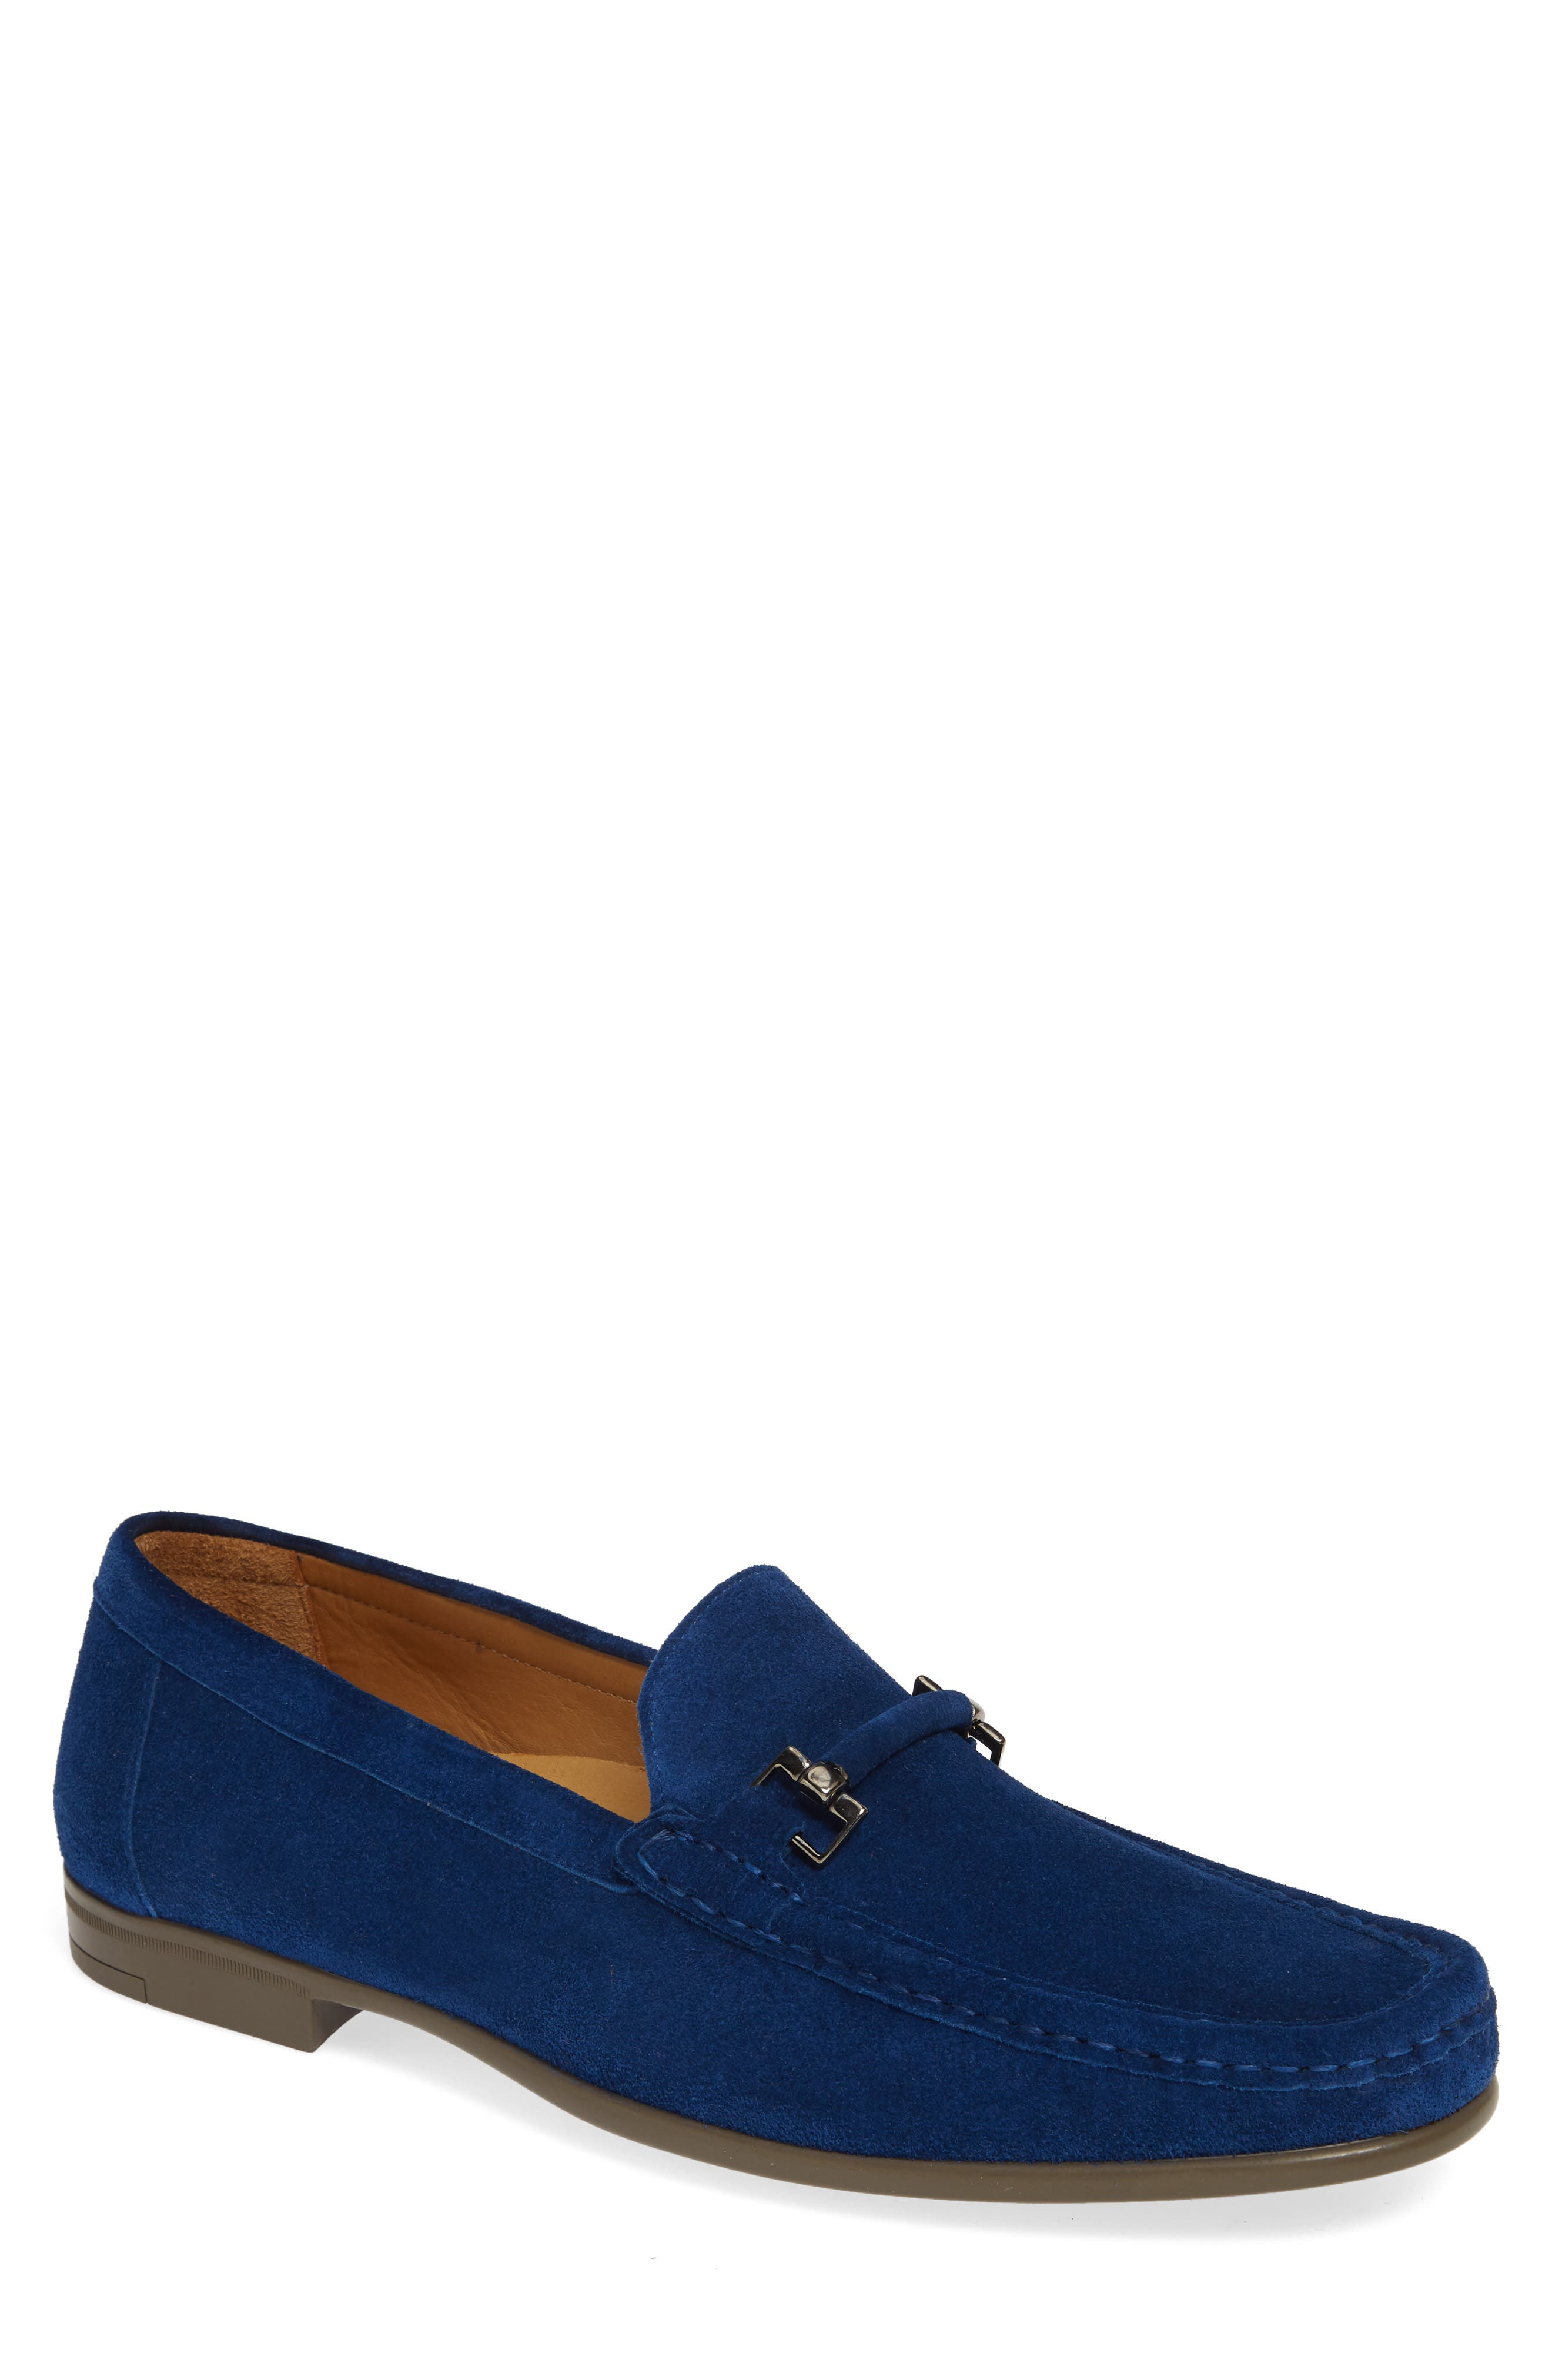 Mezlan Landa Bit Loafer, Blue